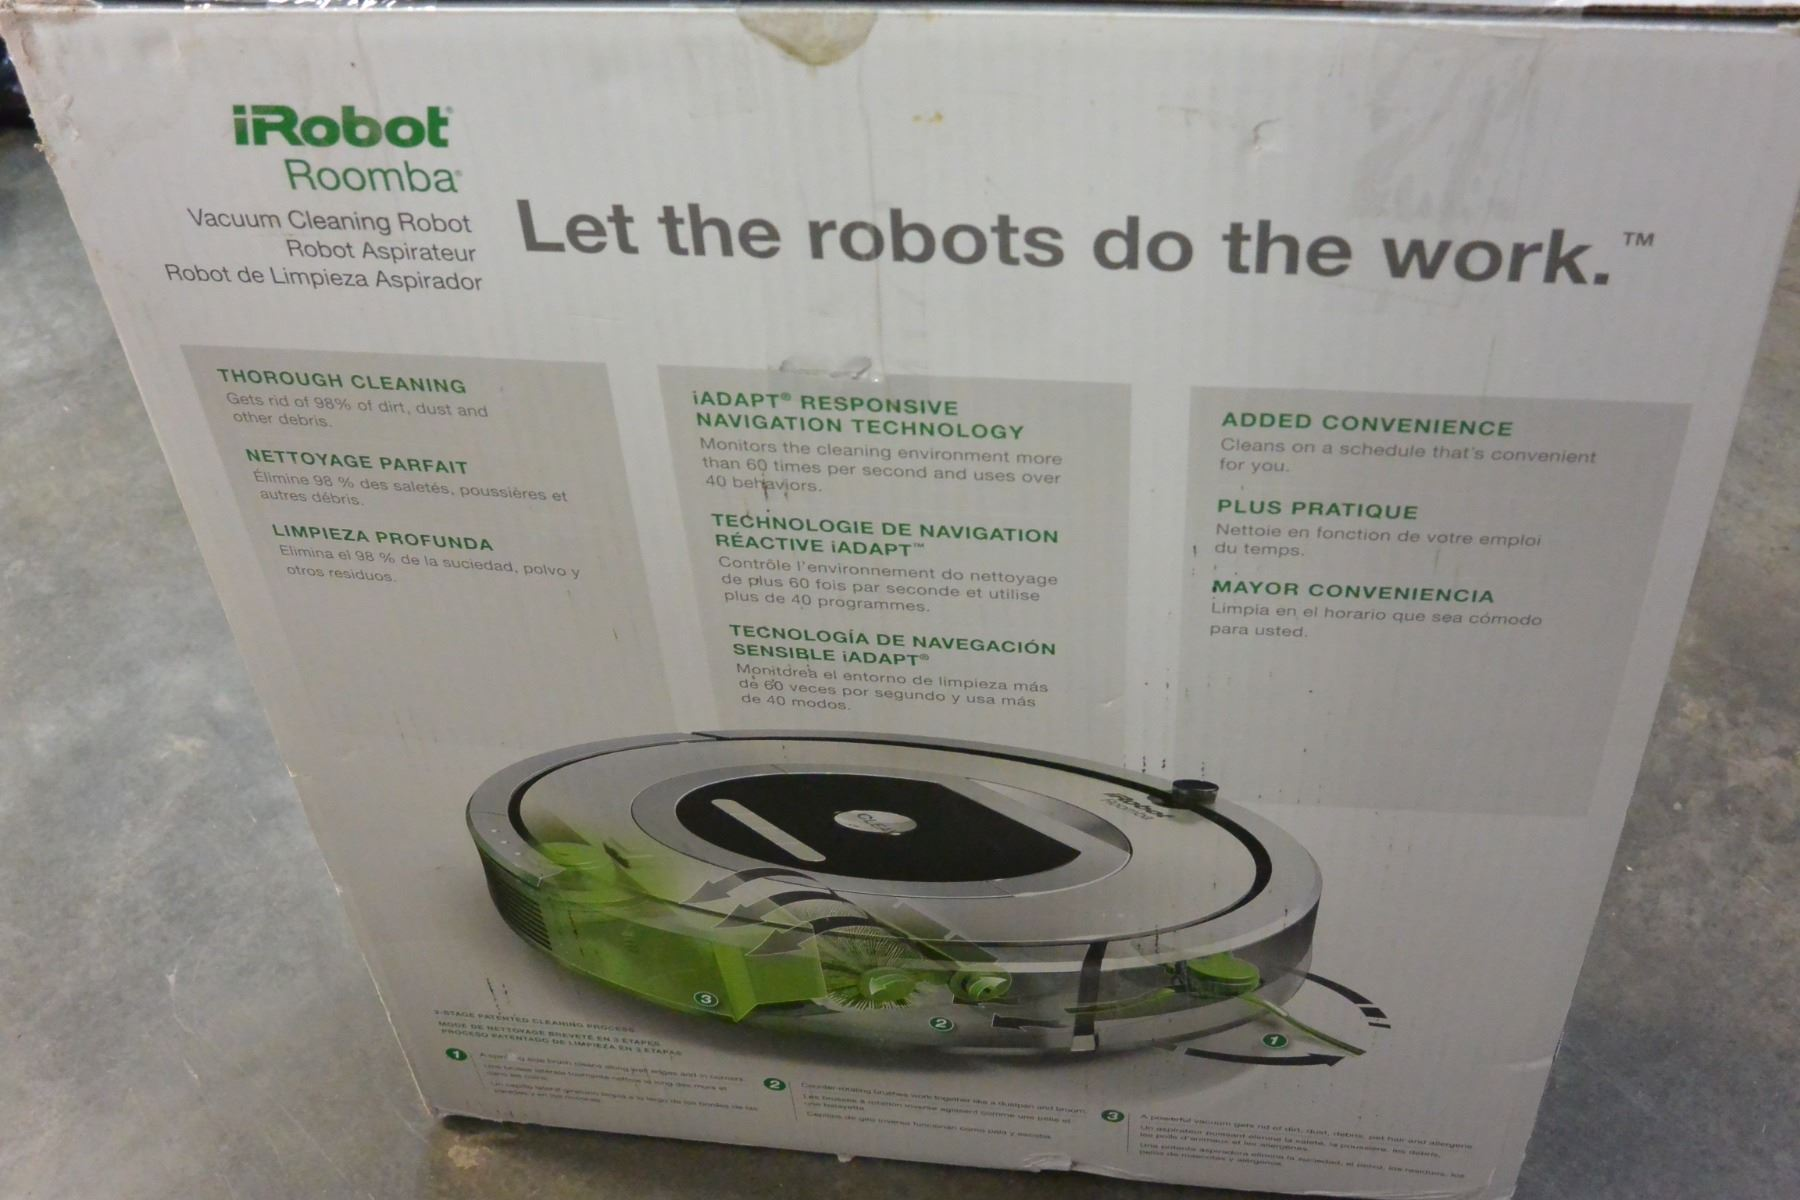 OPEN BOX IROBOT ROOMBA 761, TESTED, WORKING RETAIL $599